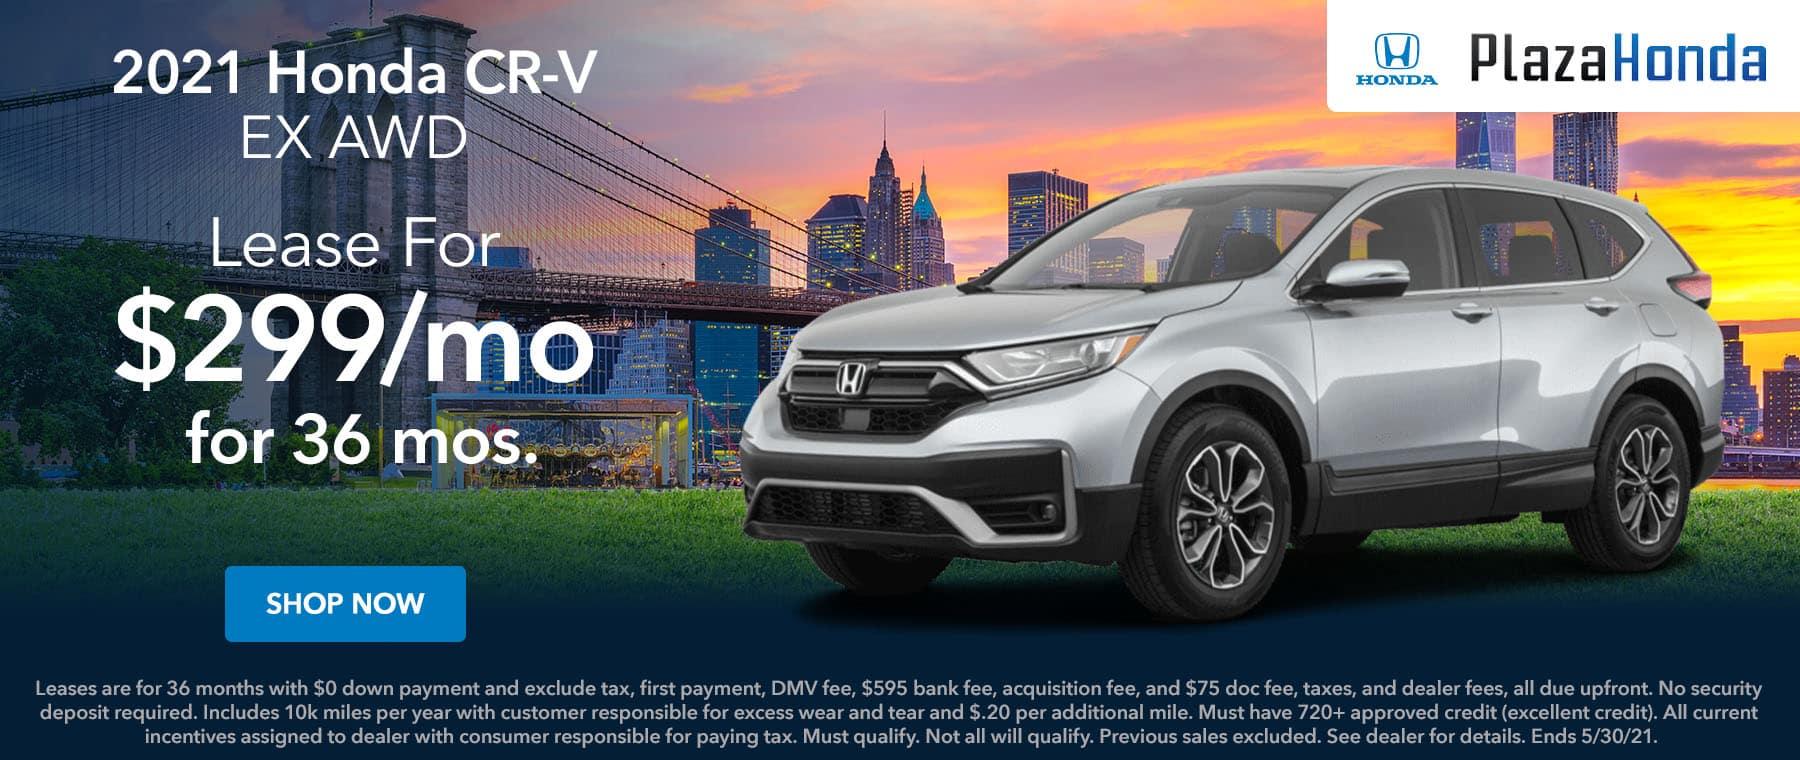 05-06-21-Hero-Honda-CRV-1800×760